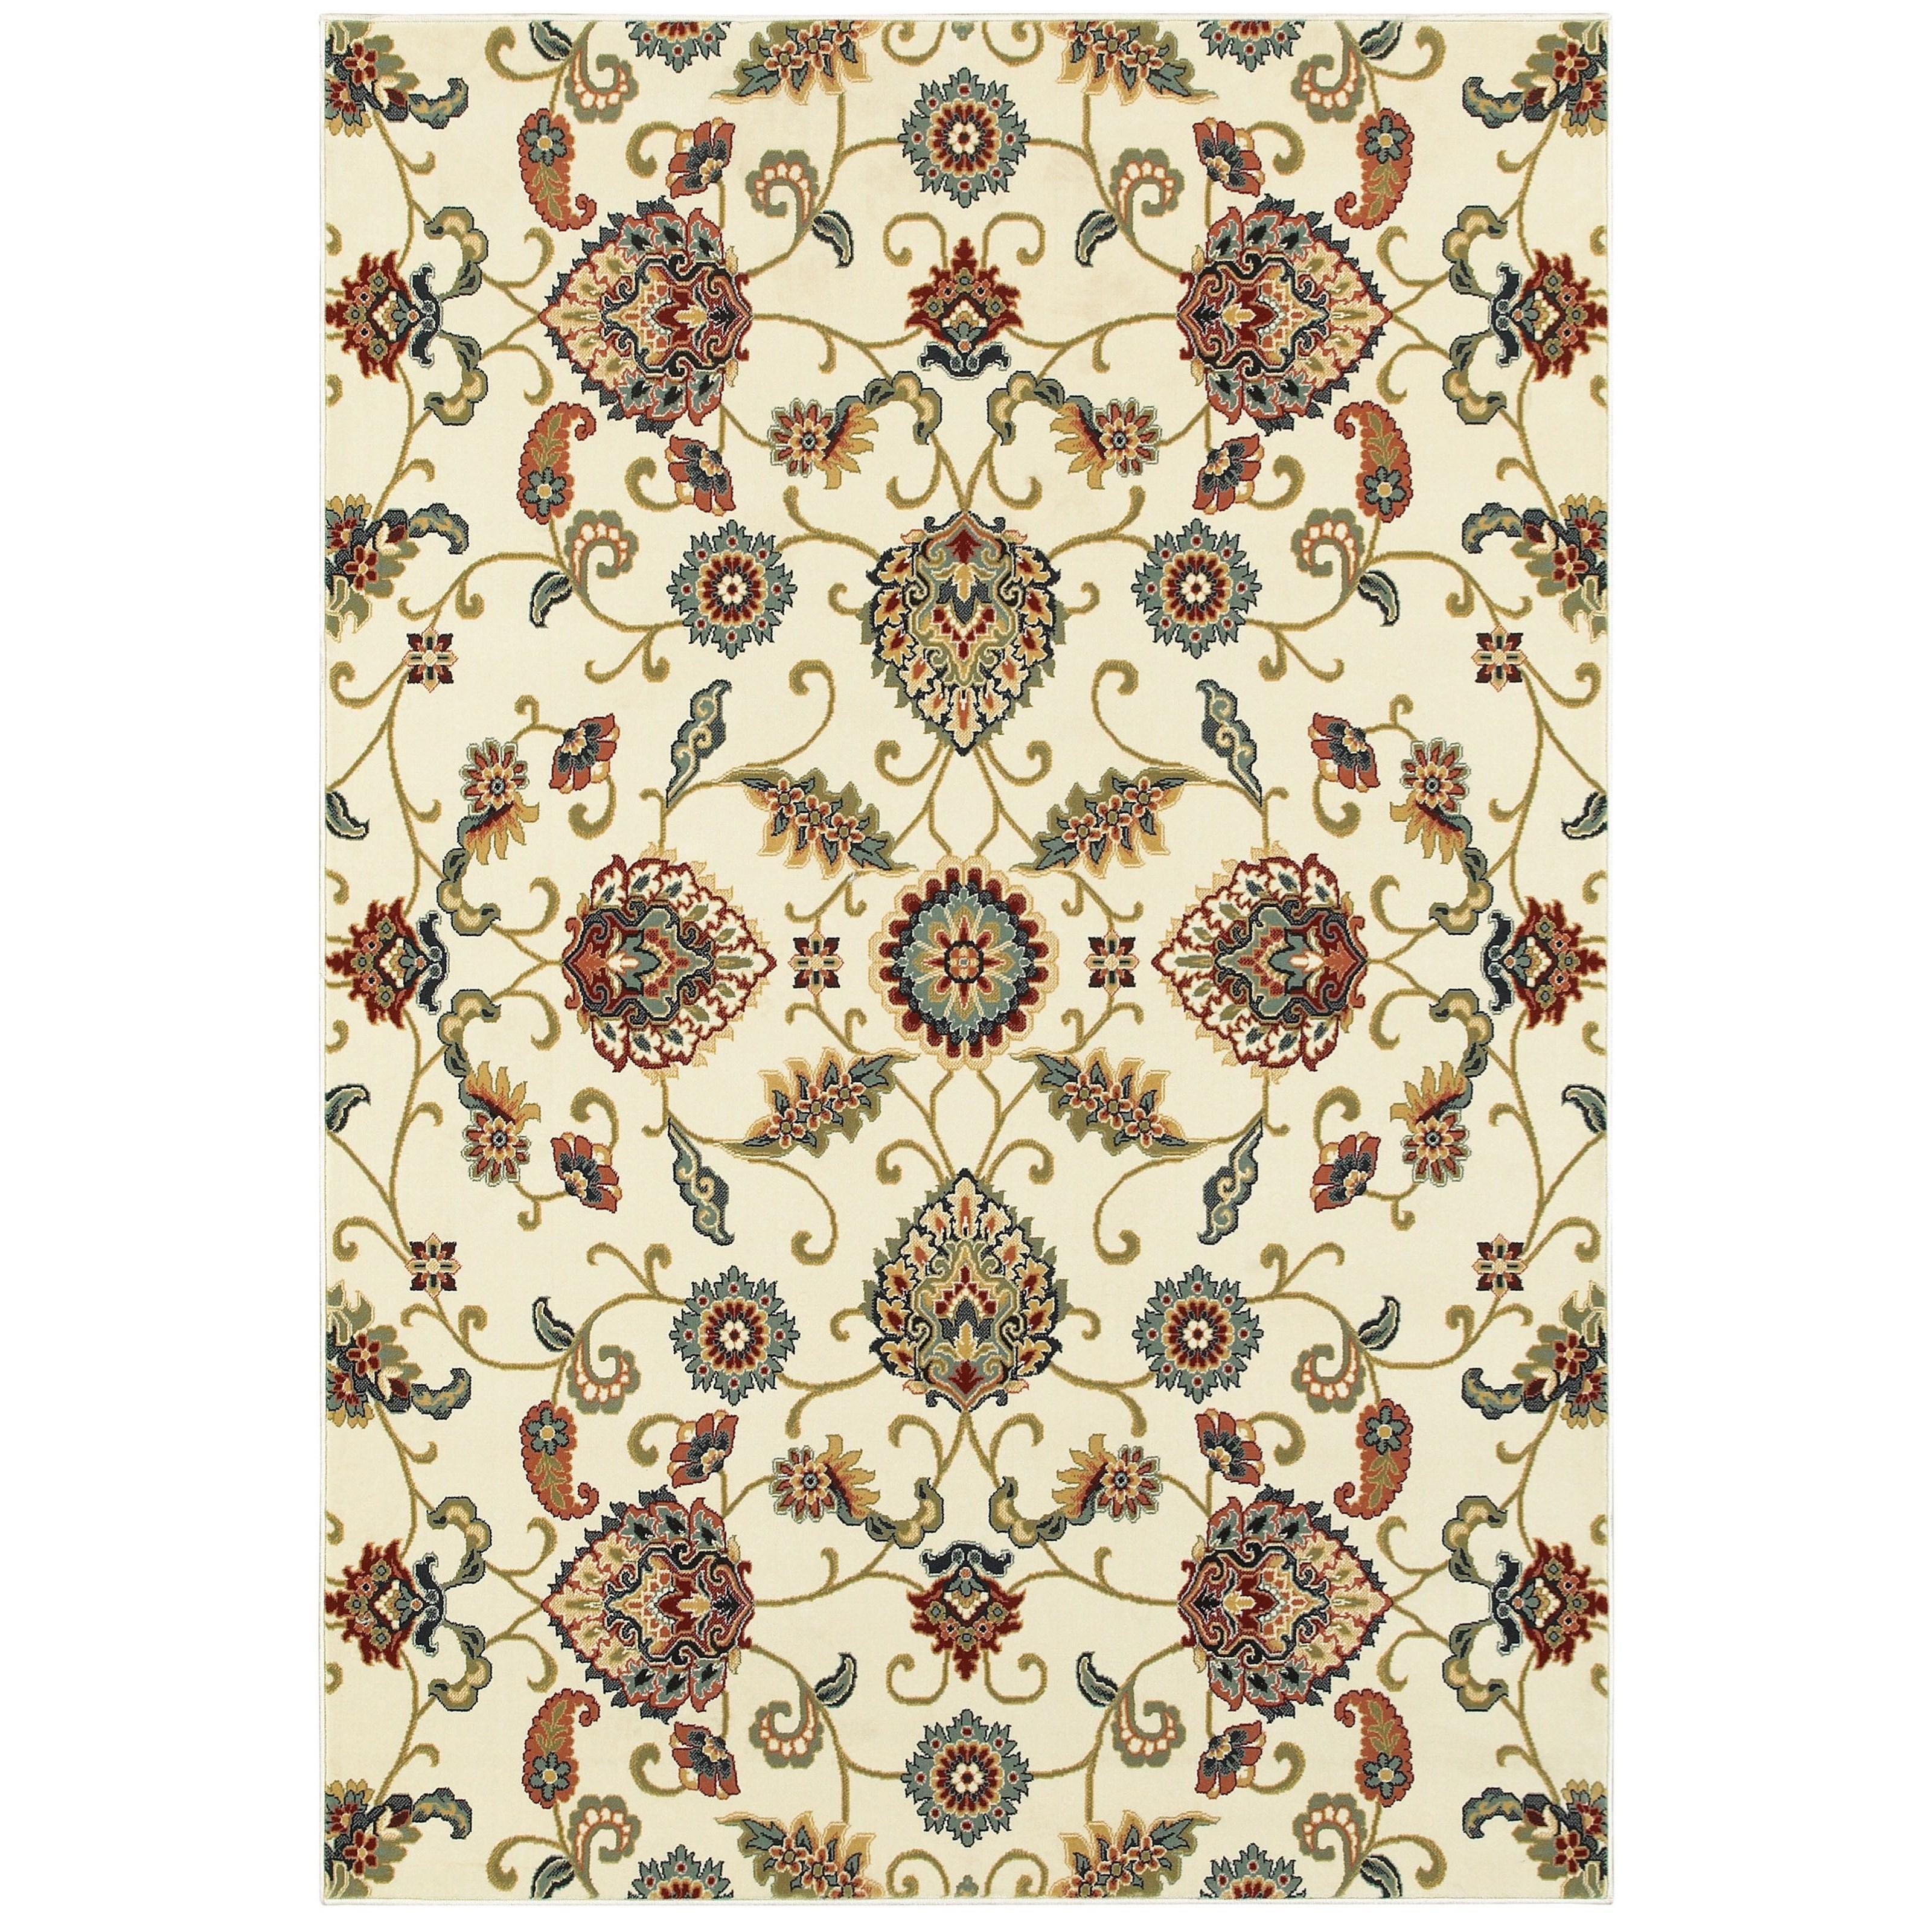 "Kashan 9'10"" X 12'10"" Rectangle Rug by Oriental Weavers at Lucas Furniture & Mattress"